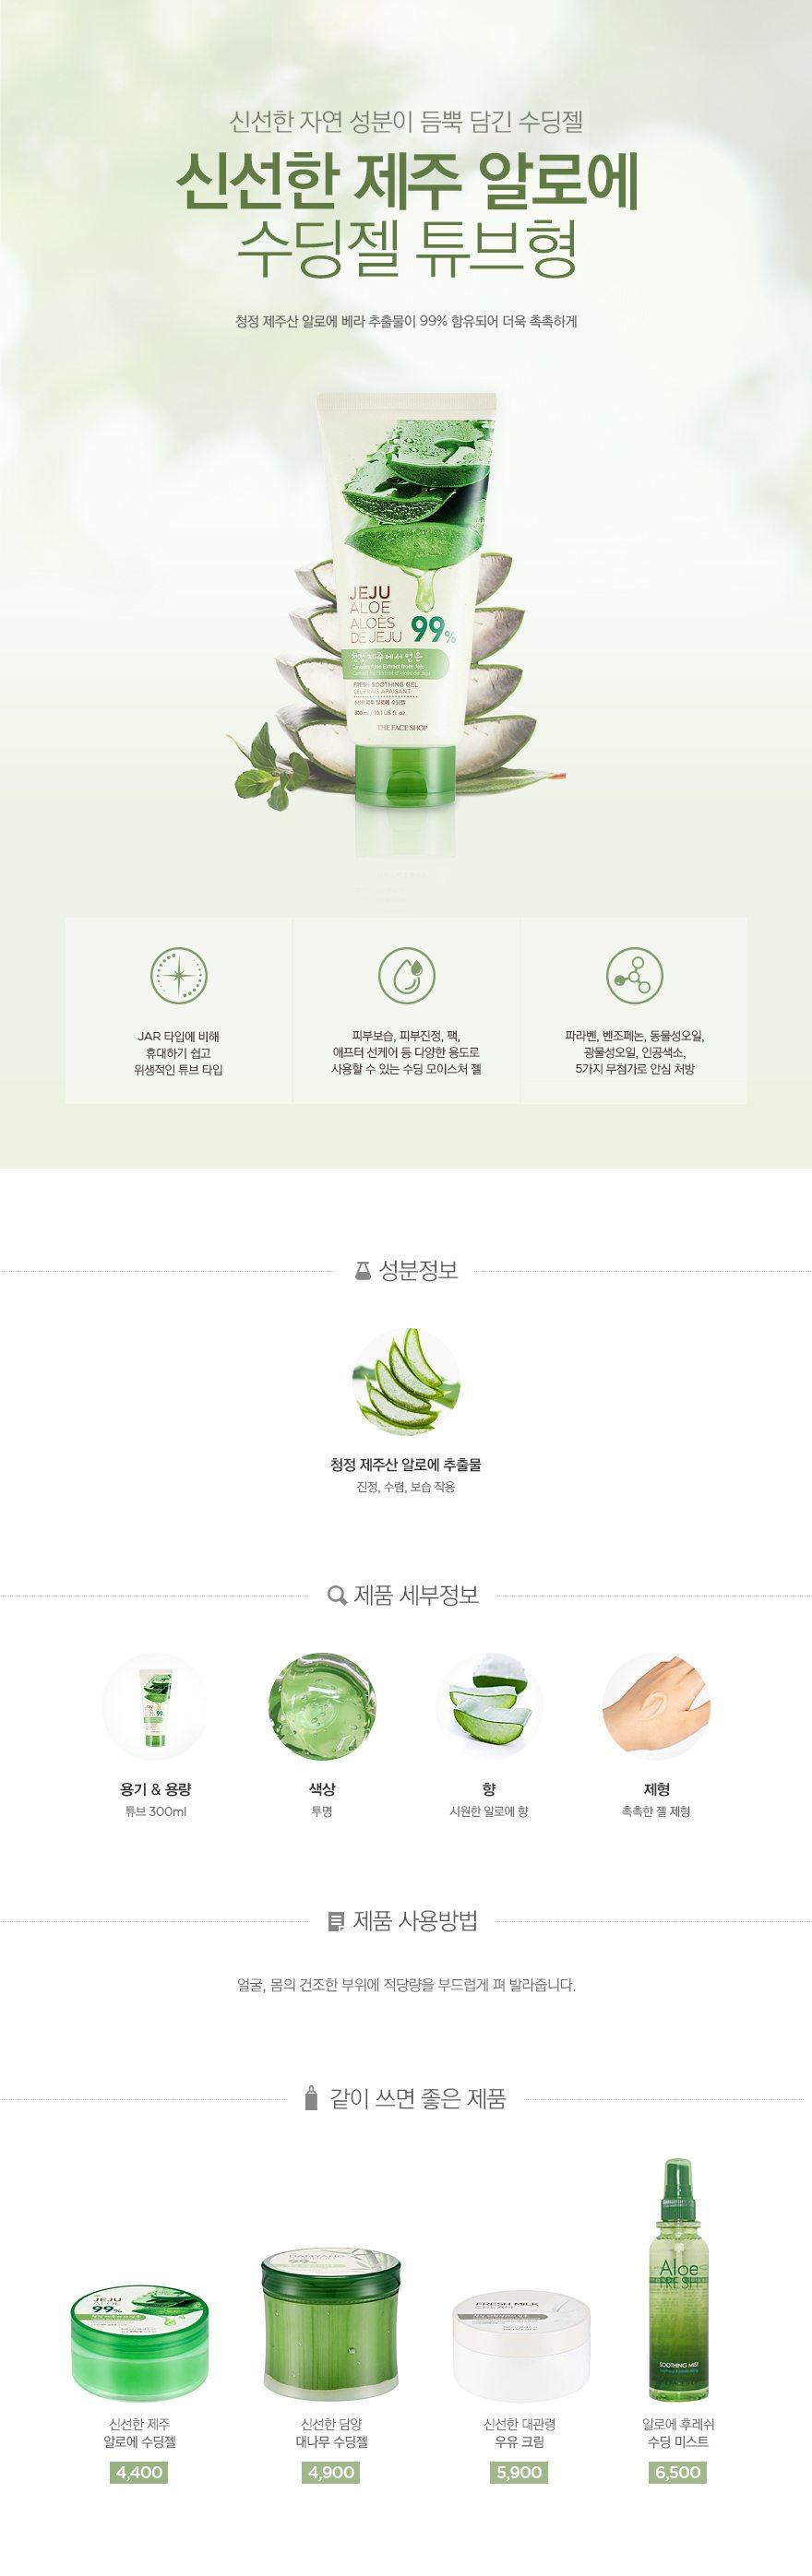 The Face Shop Jeju Aloe 99 Fresh Soothing Gel Korean Body Care K Beauty Vera Shooting Nature 300ml Malaysia Singapore Indonesia